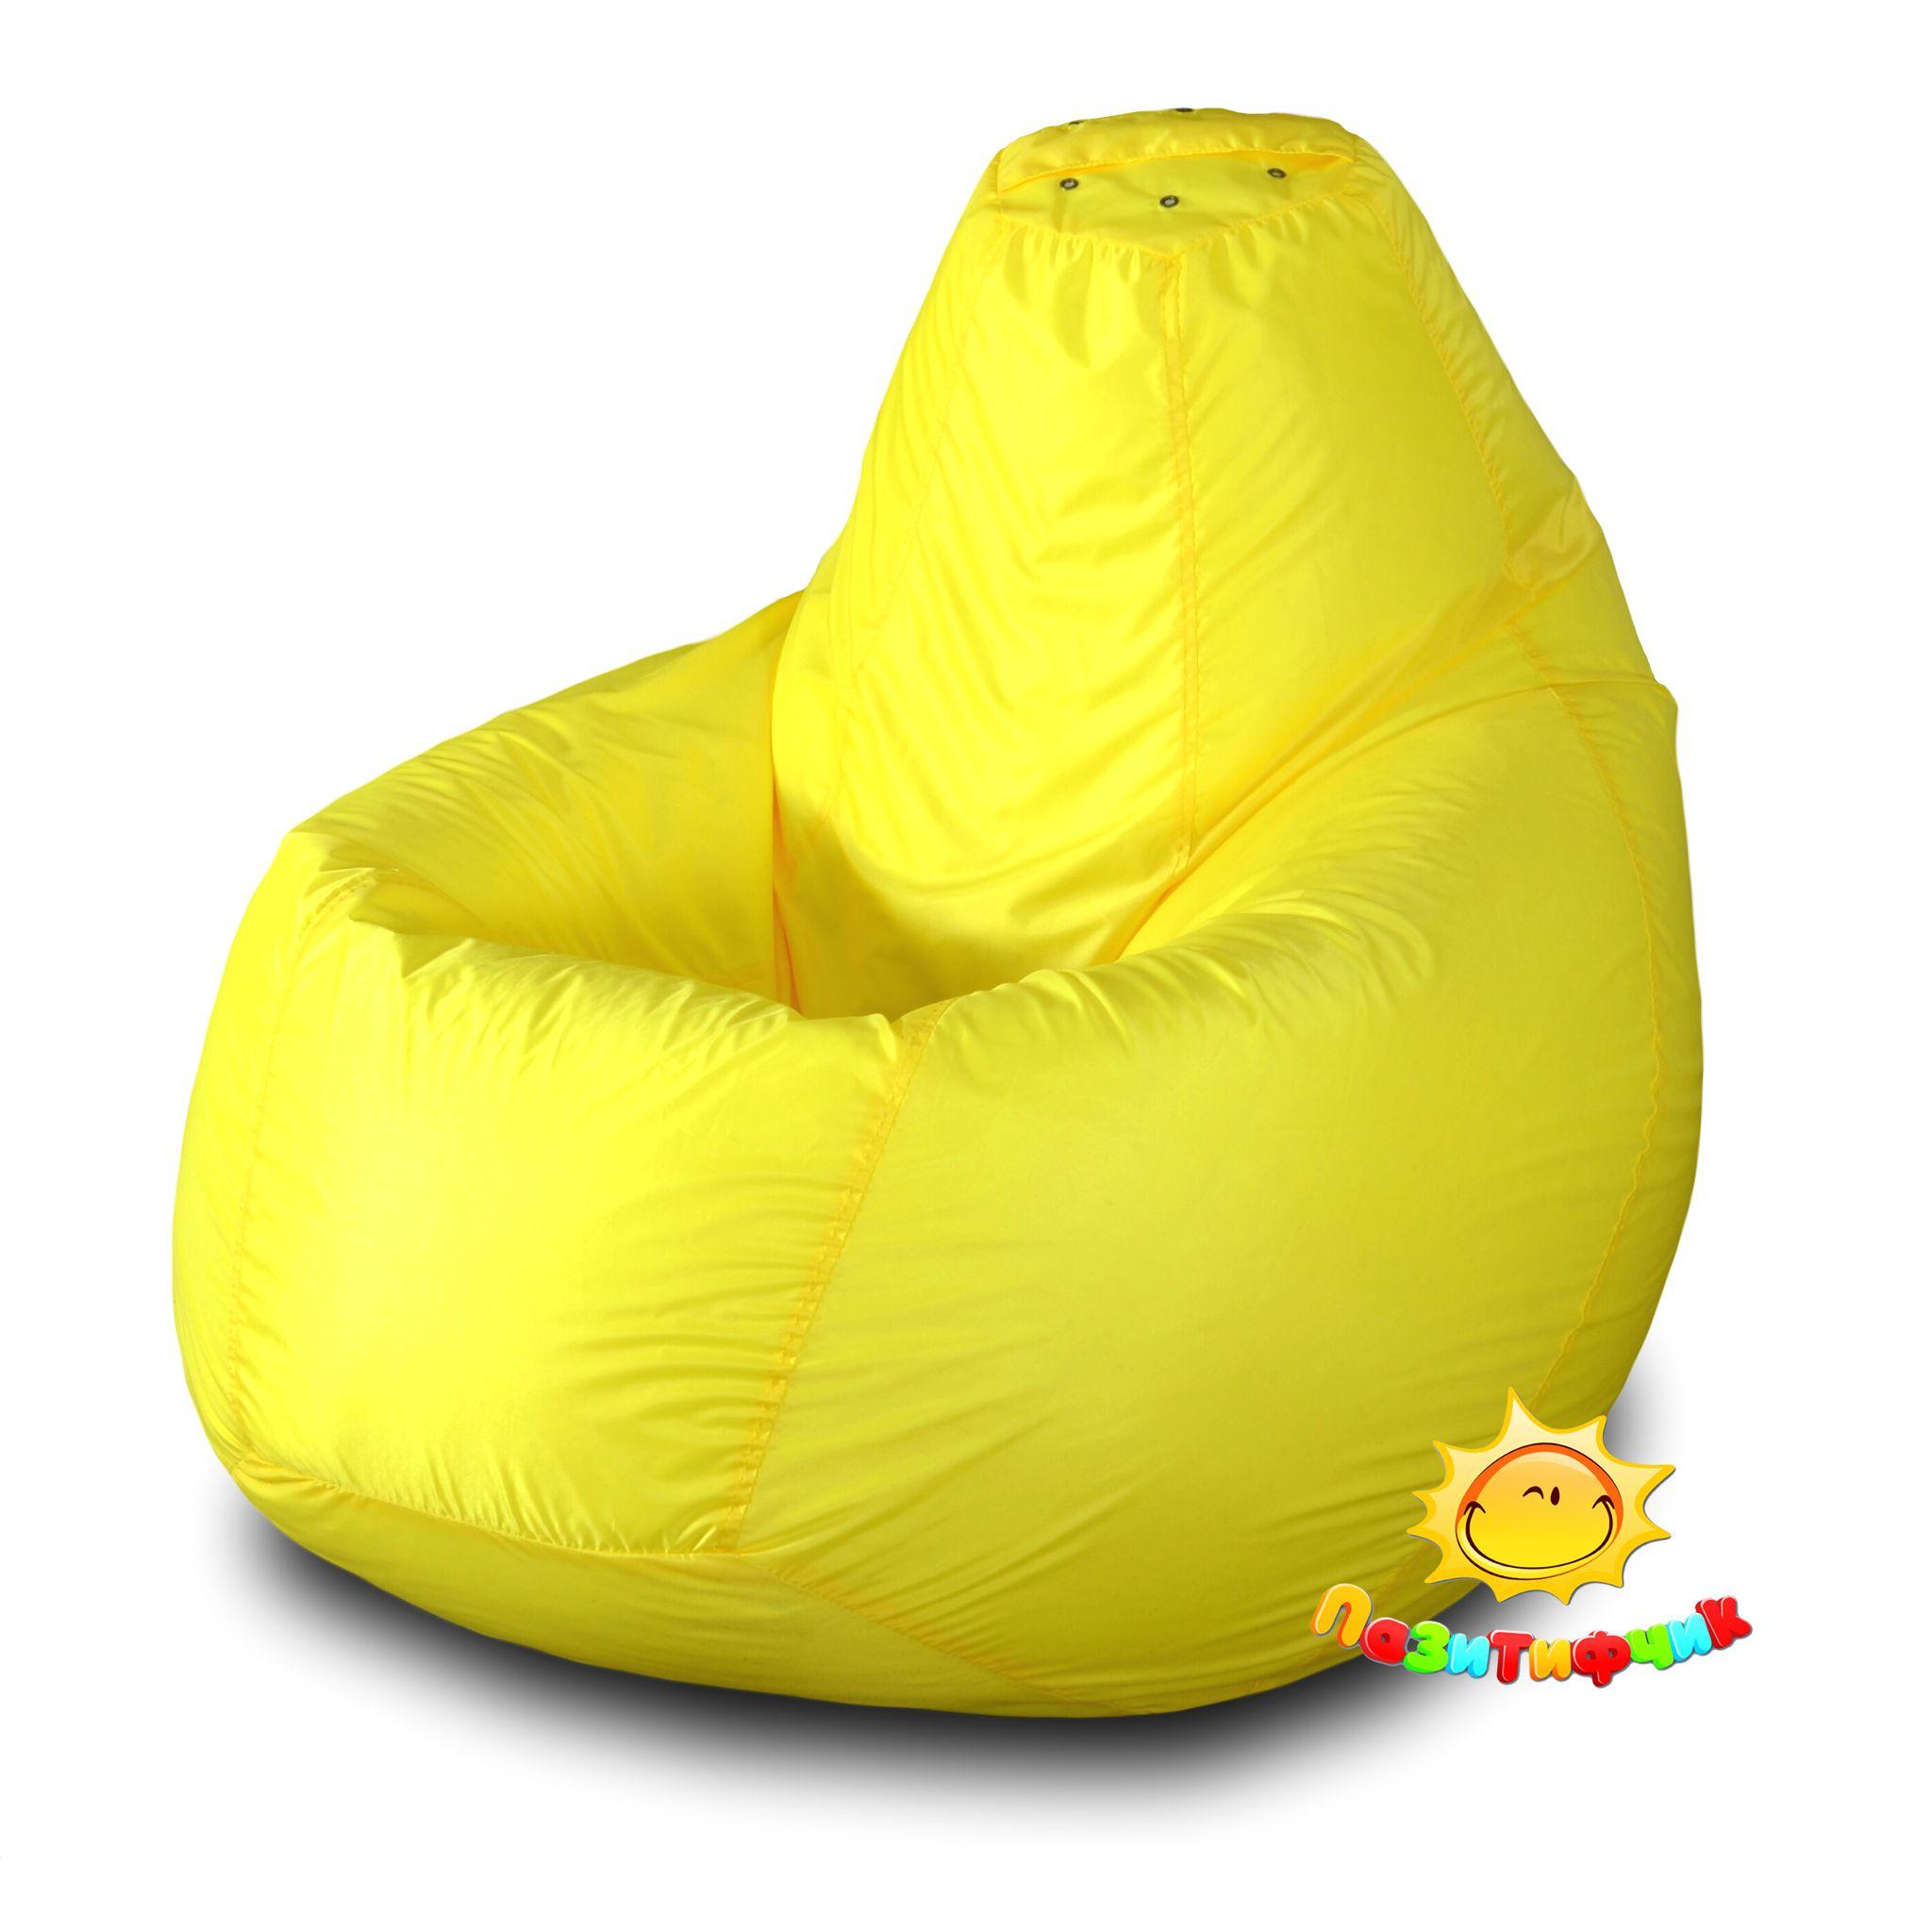 Кресло-мешок Pazitif Груша Пазитифчик, размер XL, оксфорд, желтый фото